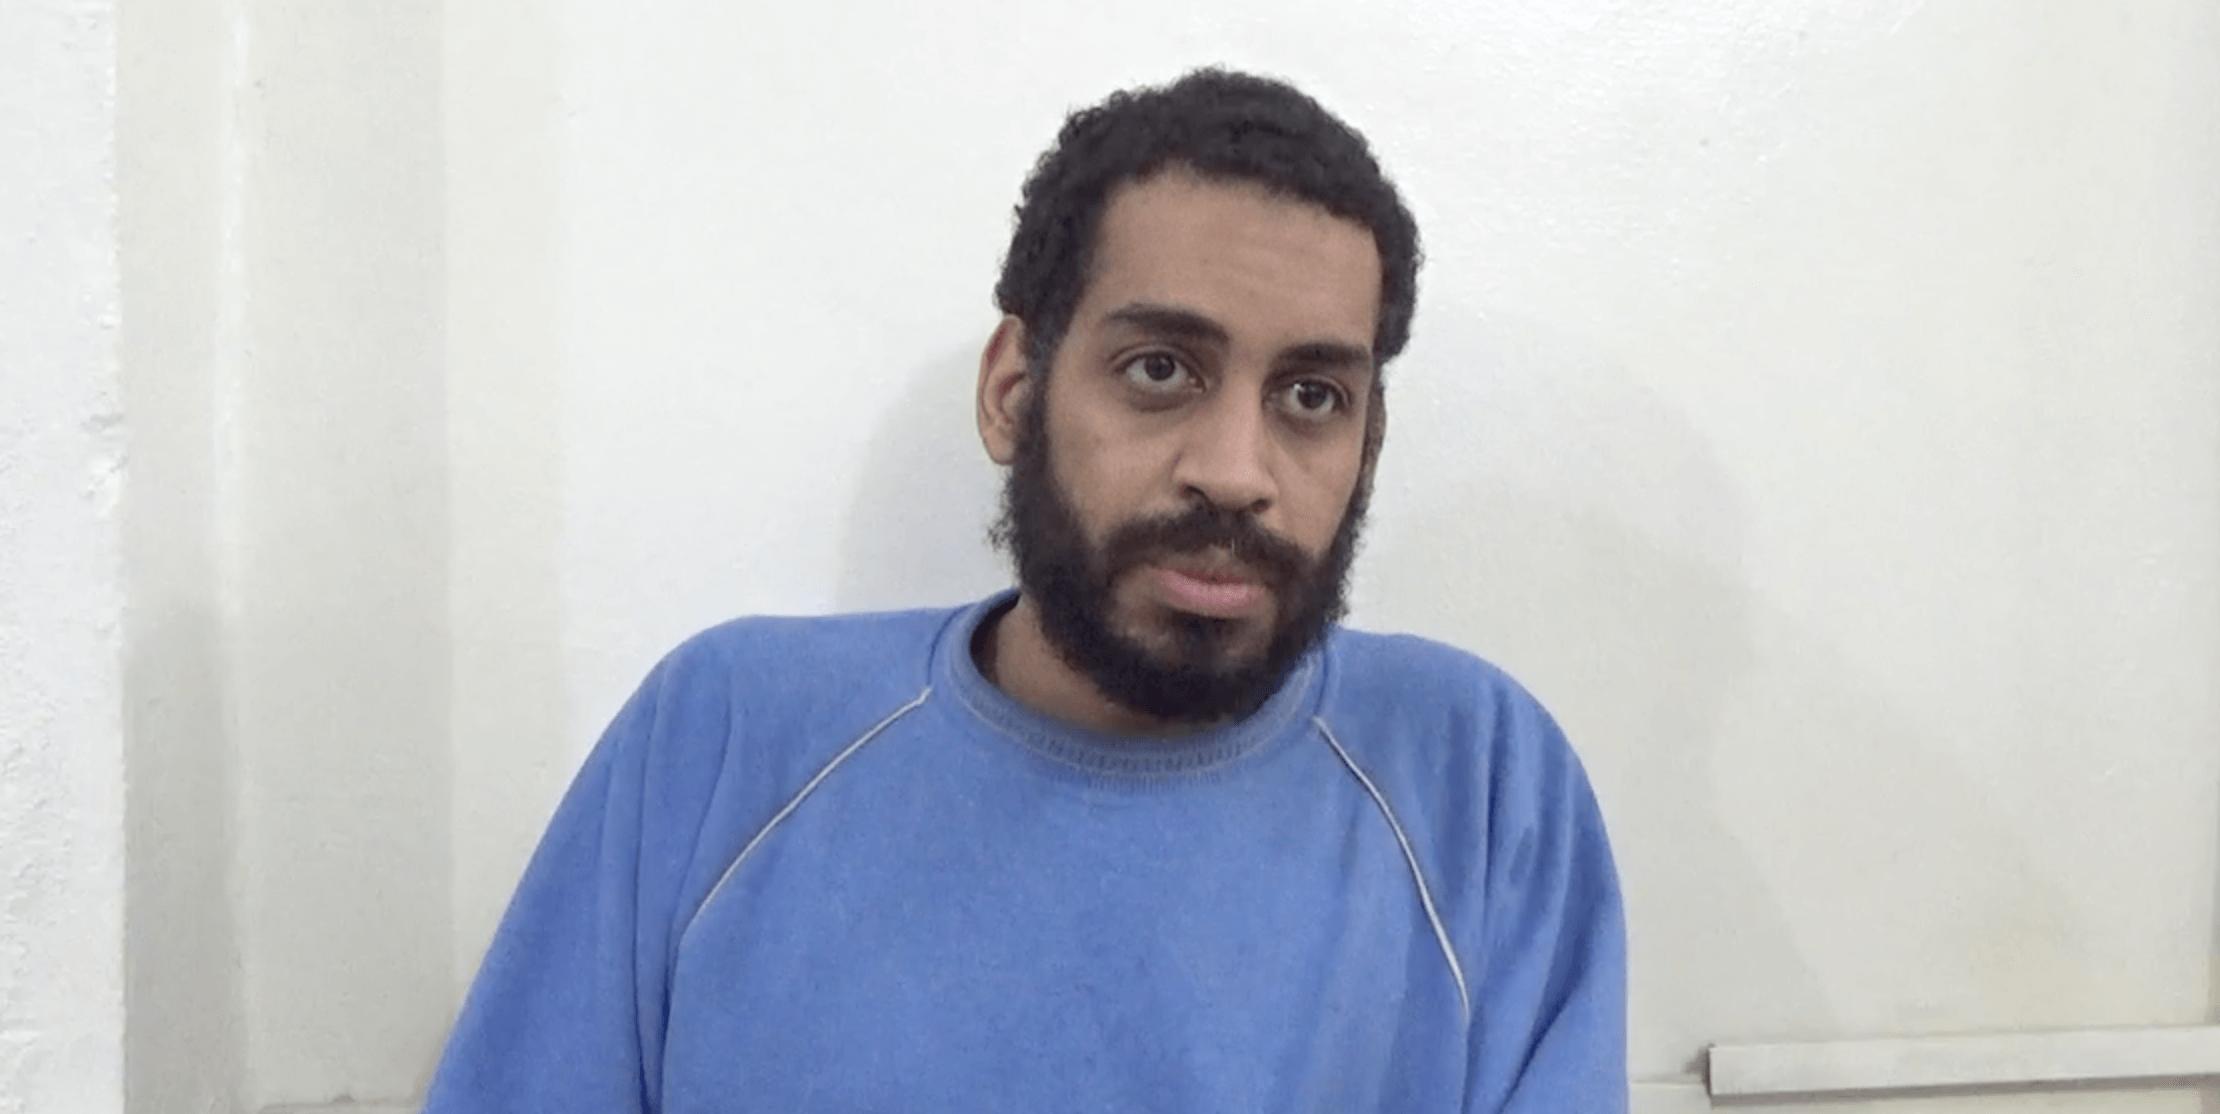 Alexanda Kotey: A Monster Made In Syria?